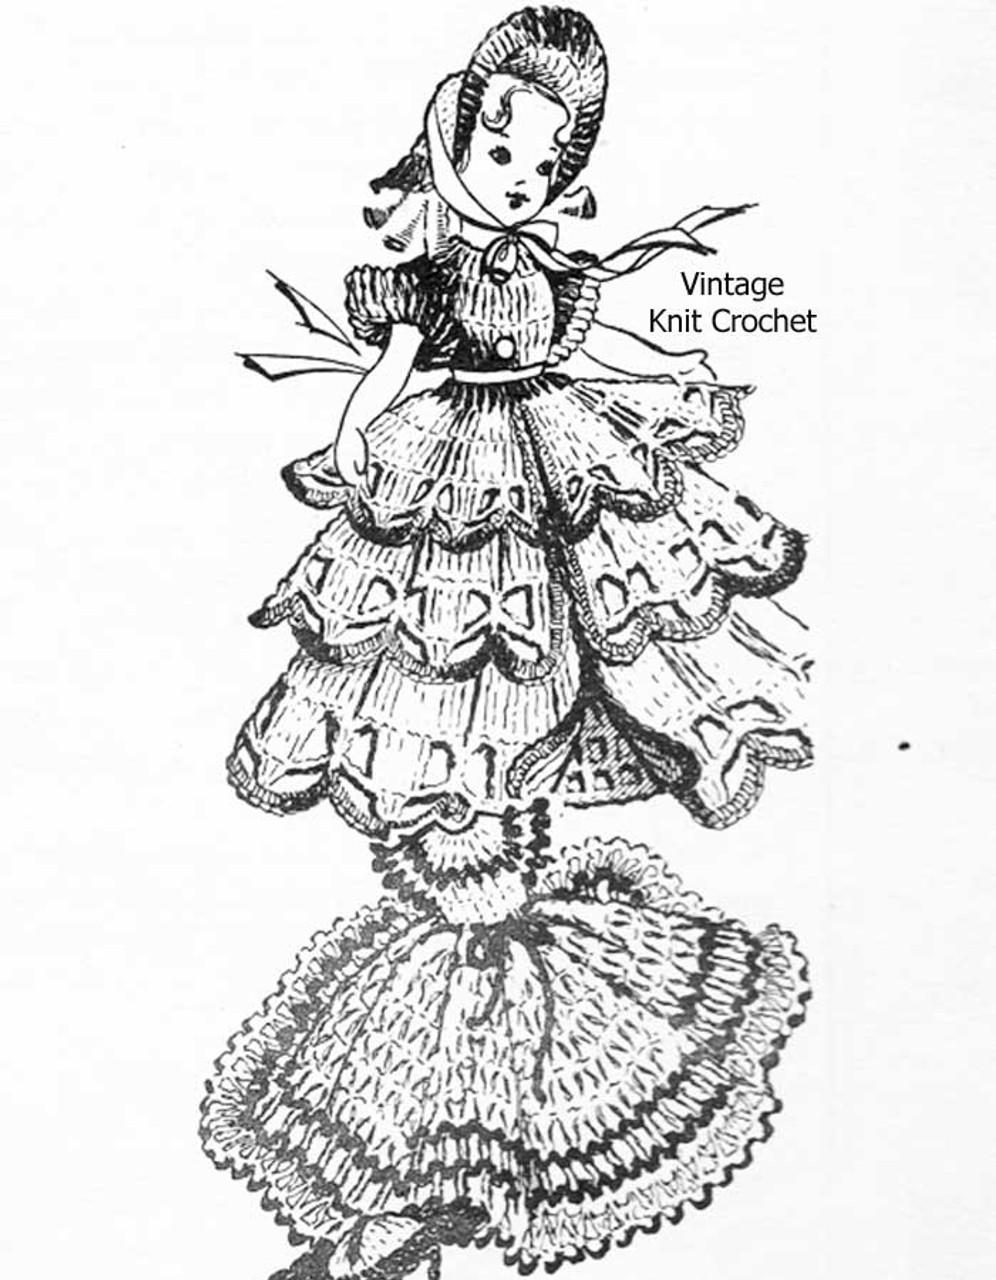 Vintage crocheted 8 inch doll dress pattern, southern belle design 856